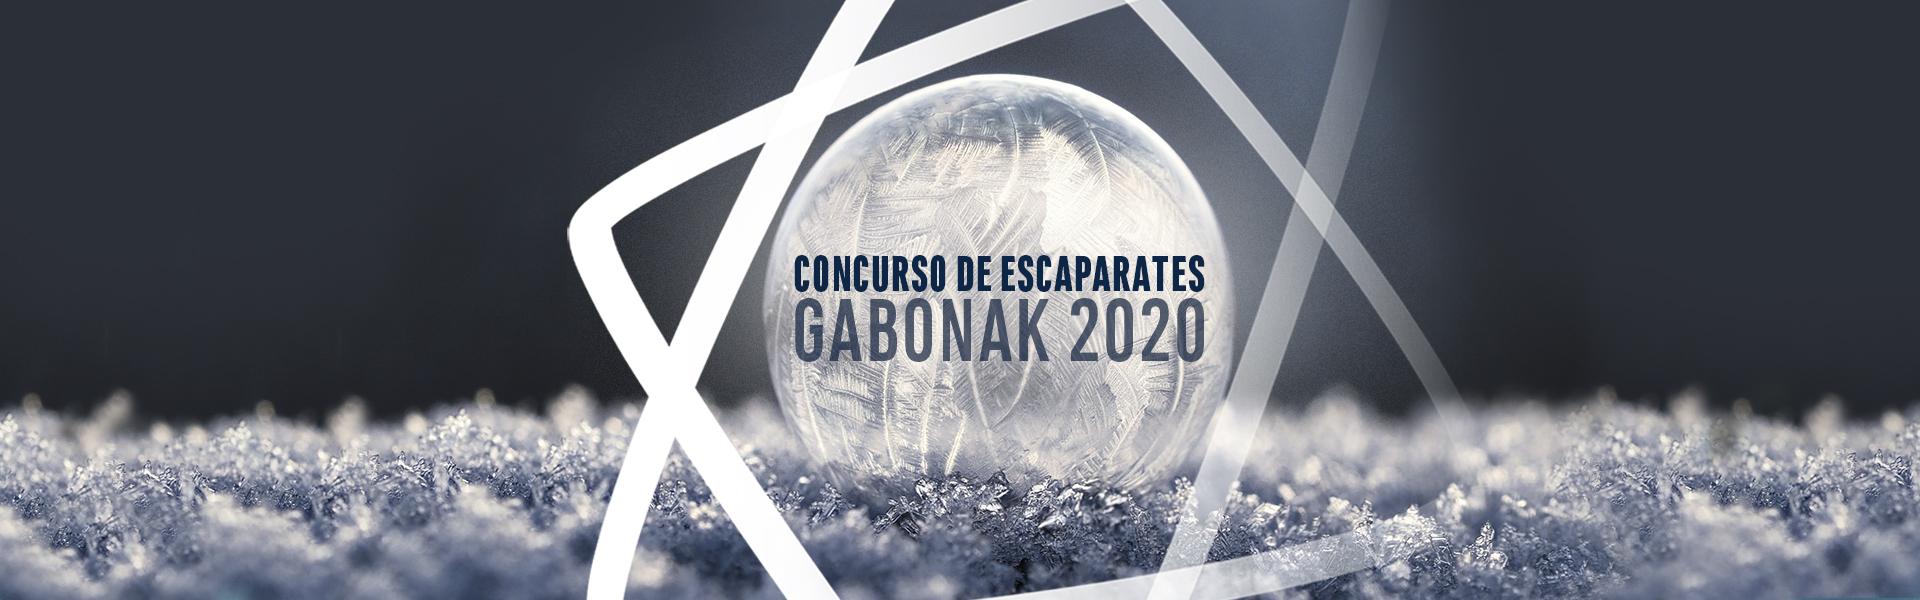 Concurso de escaparates, Gabonak 2020, San Sebastián Shops